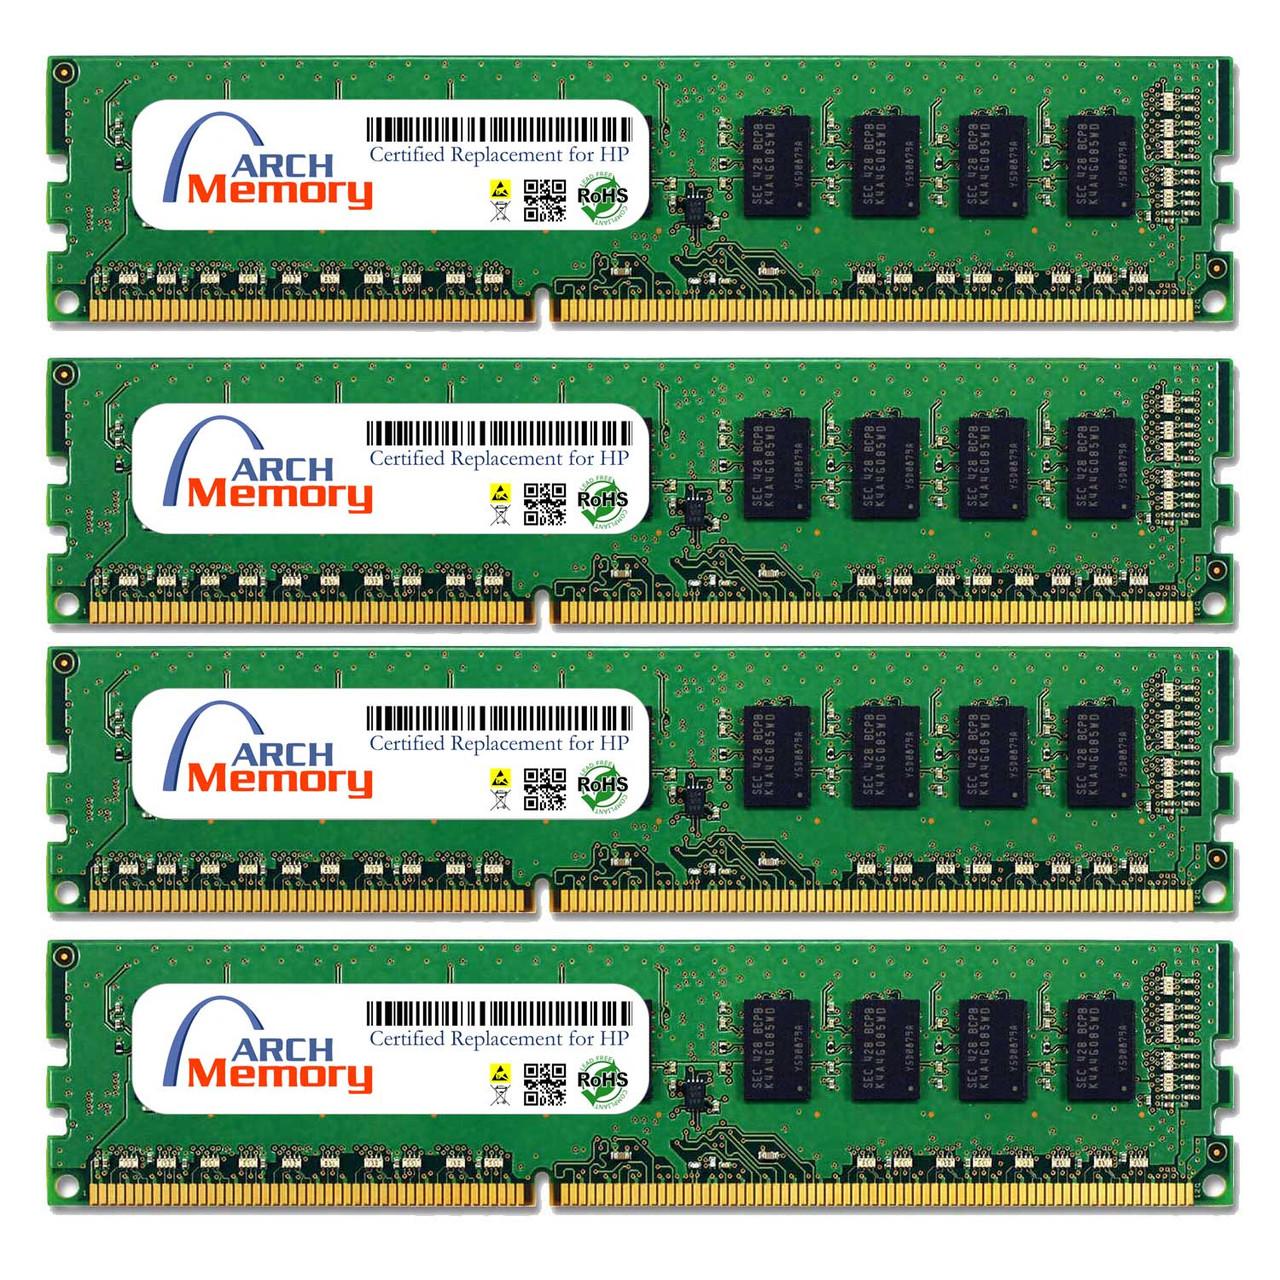 16GB A2H32AV (4 x 4GB) 240-Pin DDR3 ECC UDIMM RAM | Memory for HP